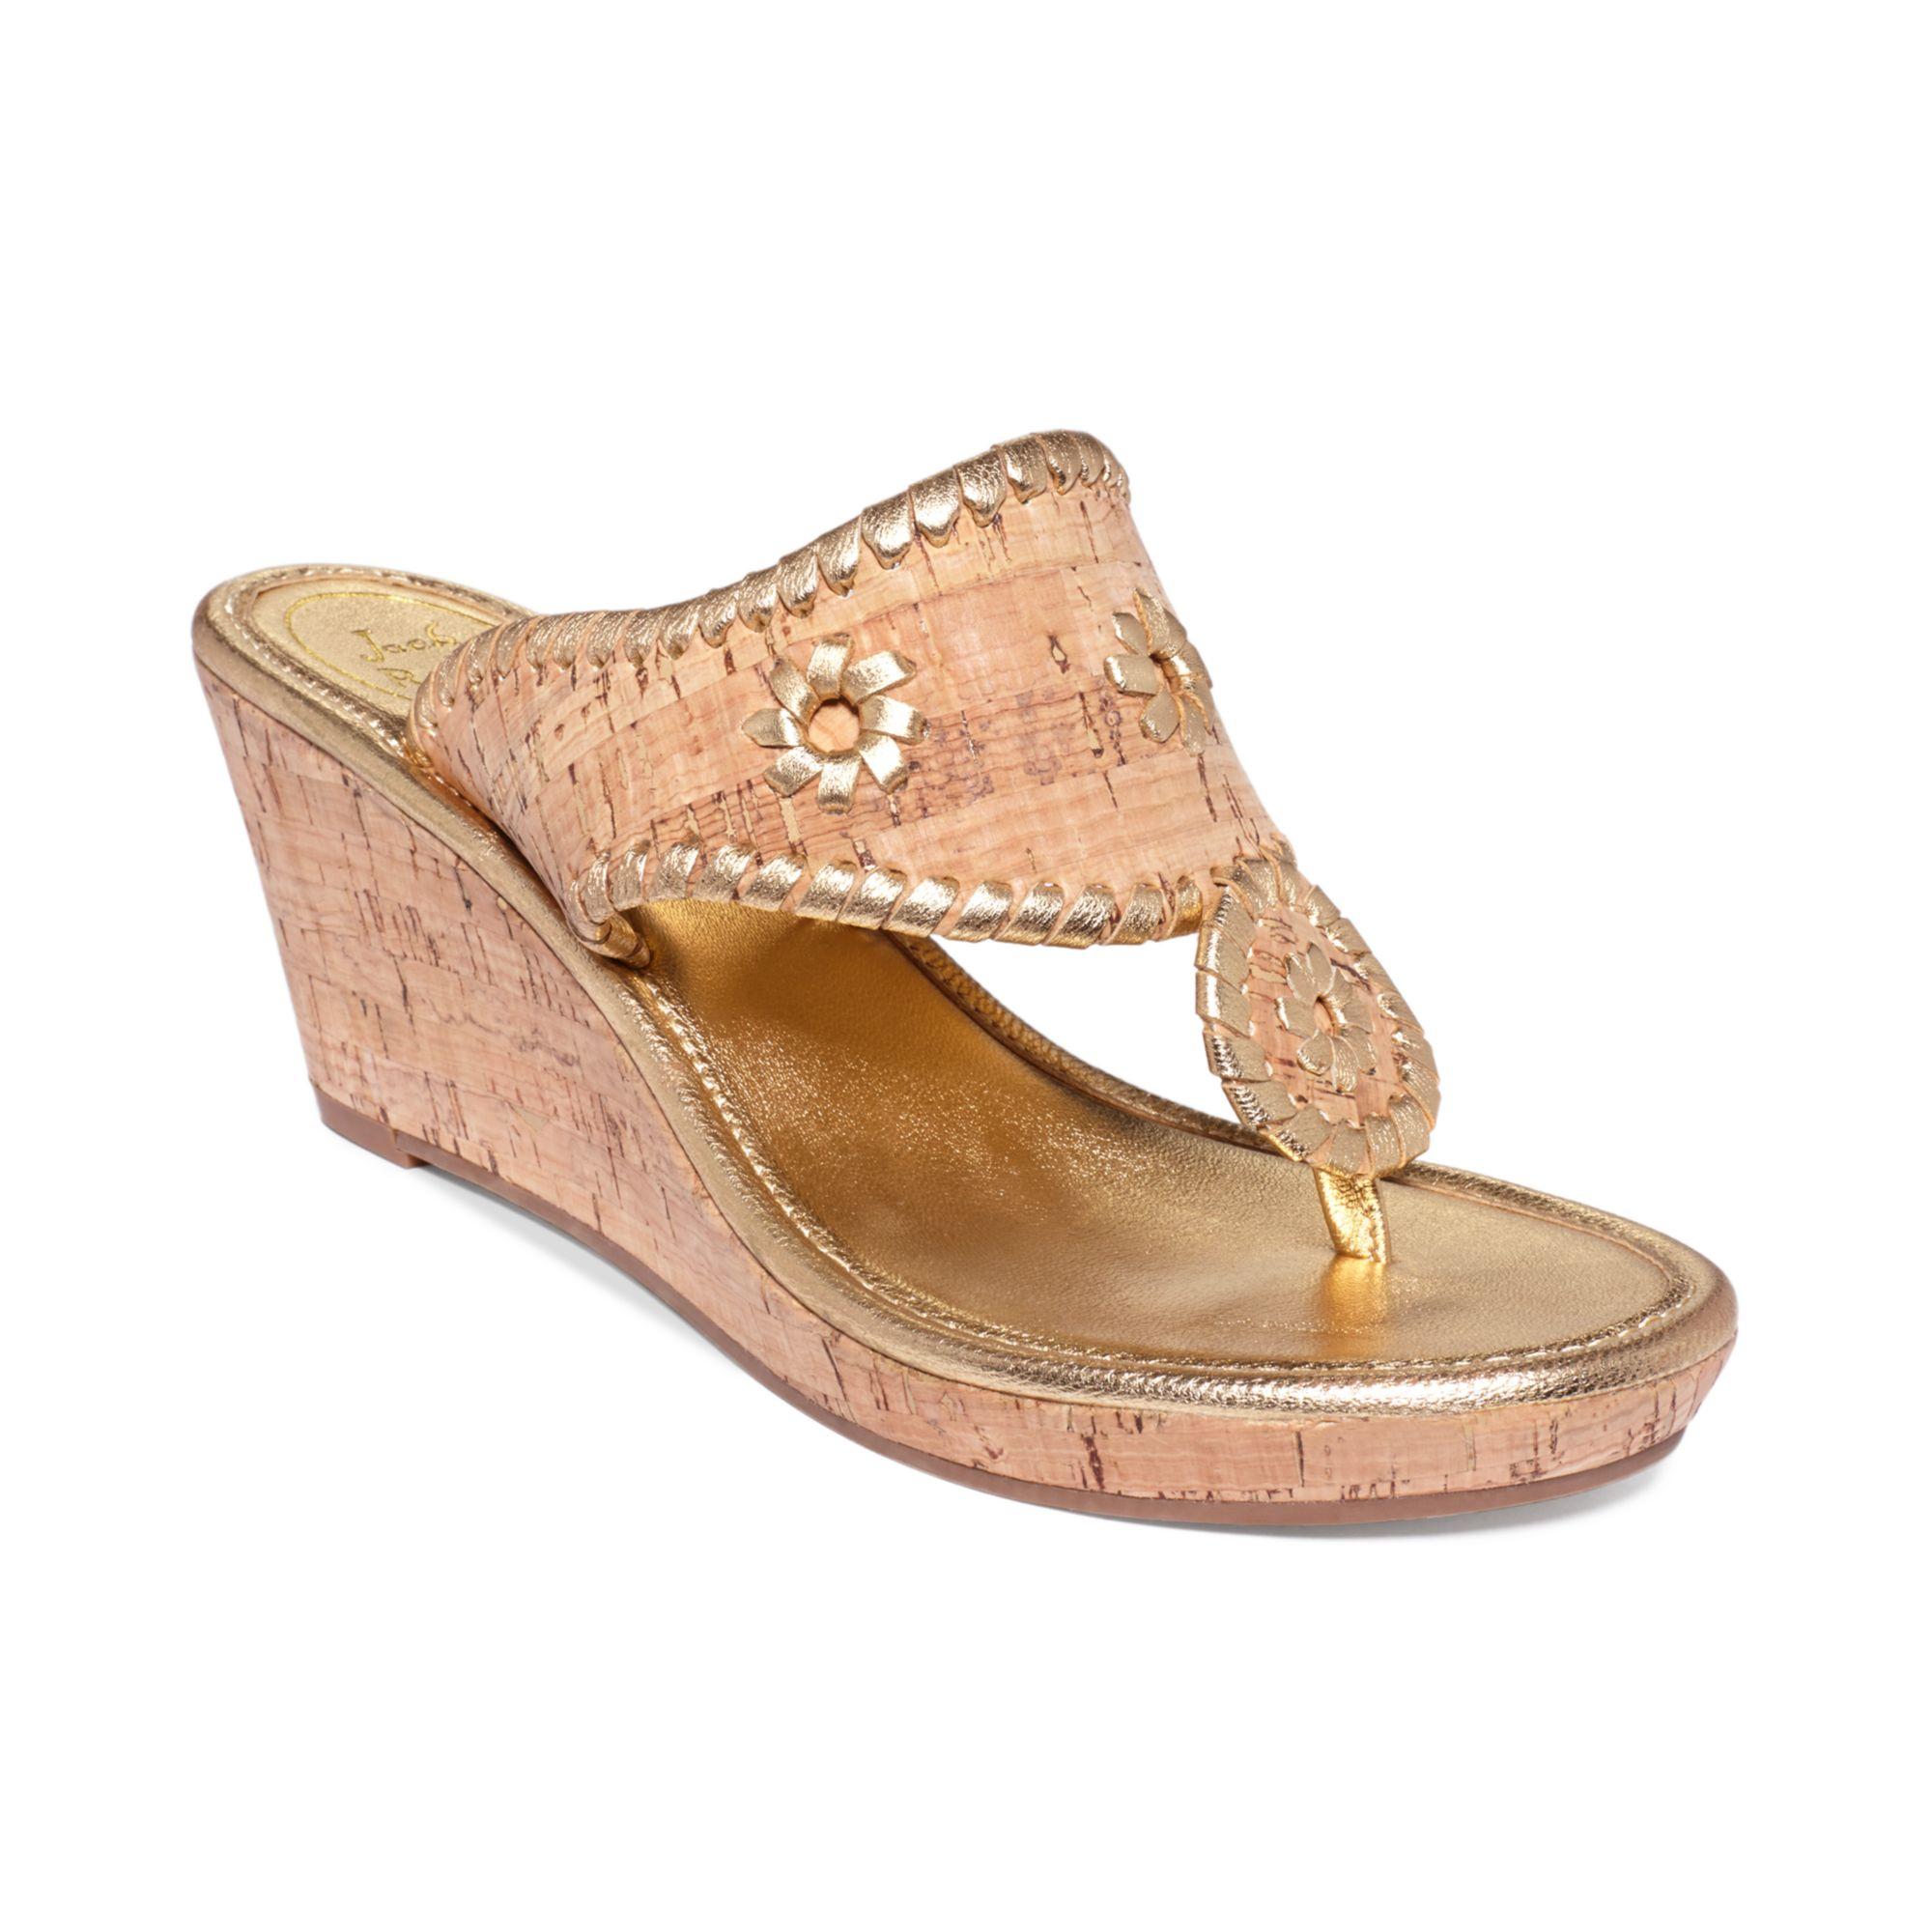 e13082ae2bd Lyst - Jack Rogers Marbella Midwedge Platform Sandals in Metallic